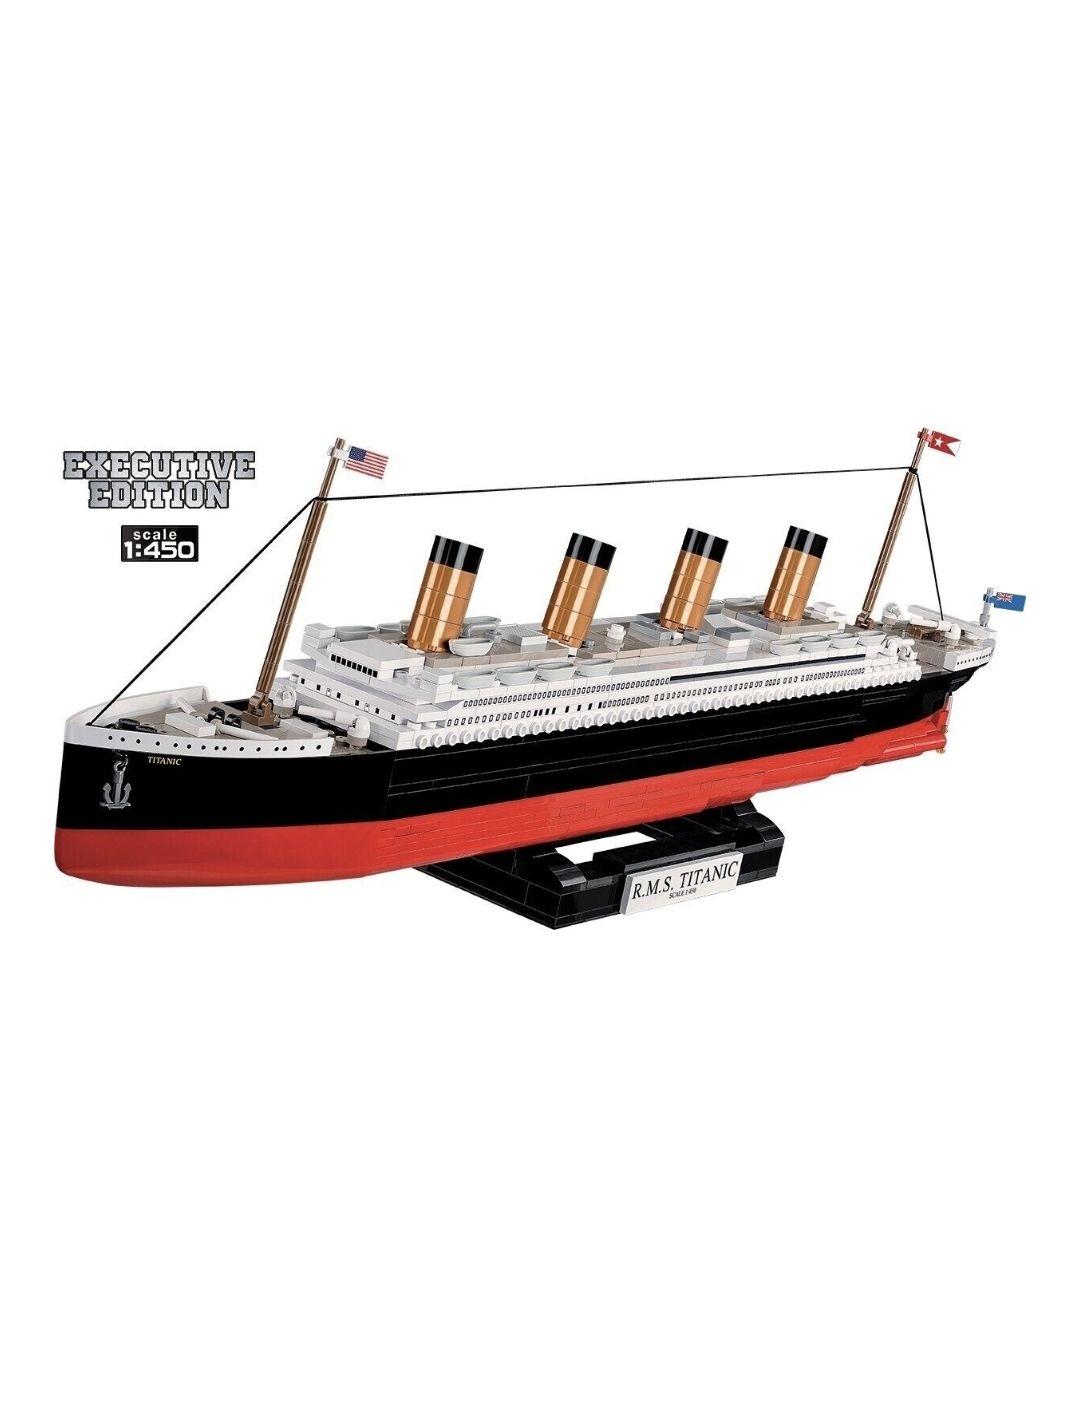 COBI Historical Collection 1928 - R.M.S. Titanic 960 Bauteile